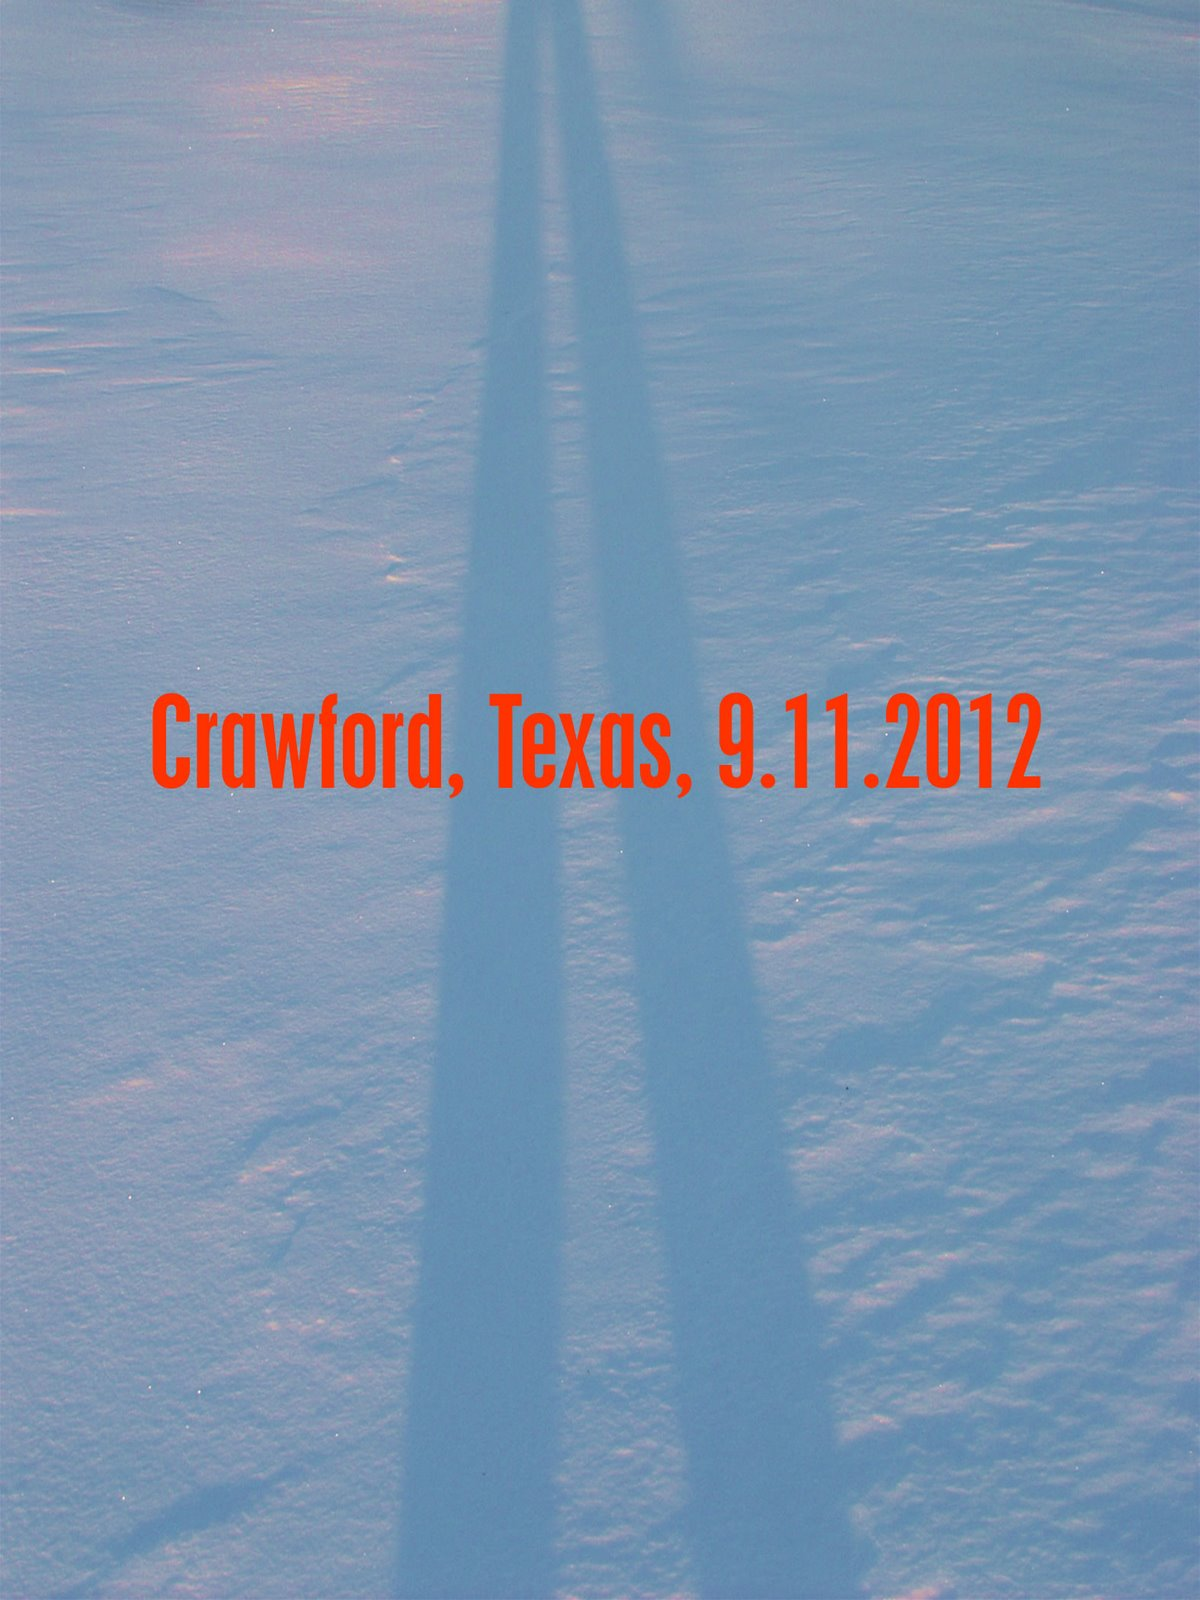 crawford texas 2012b 2.jpg